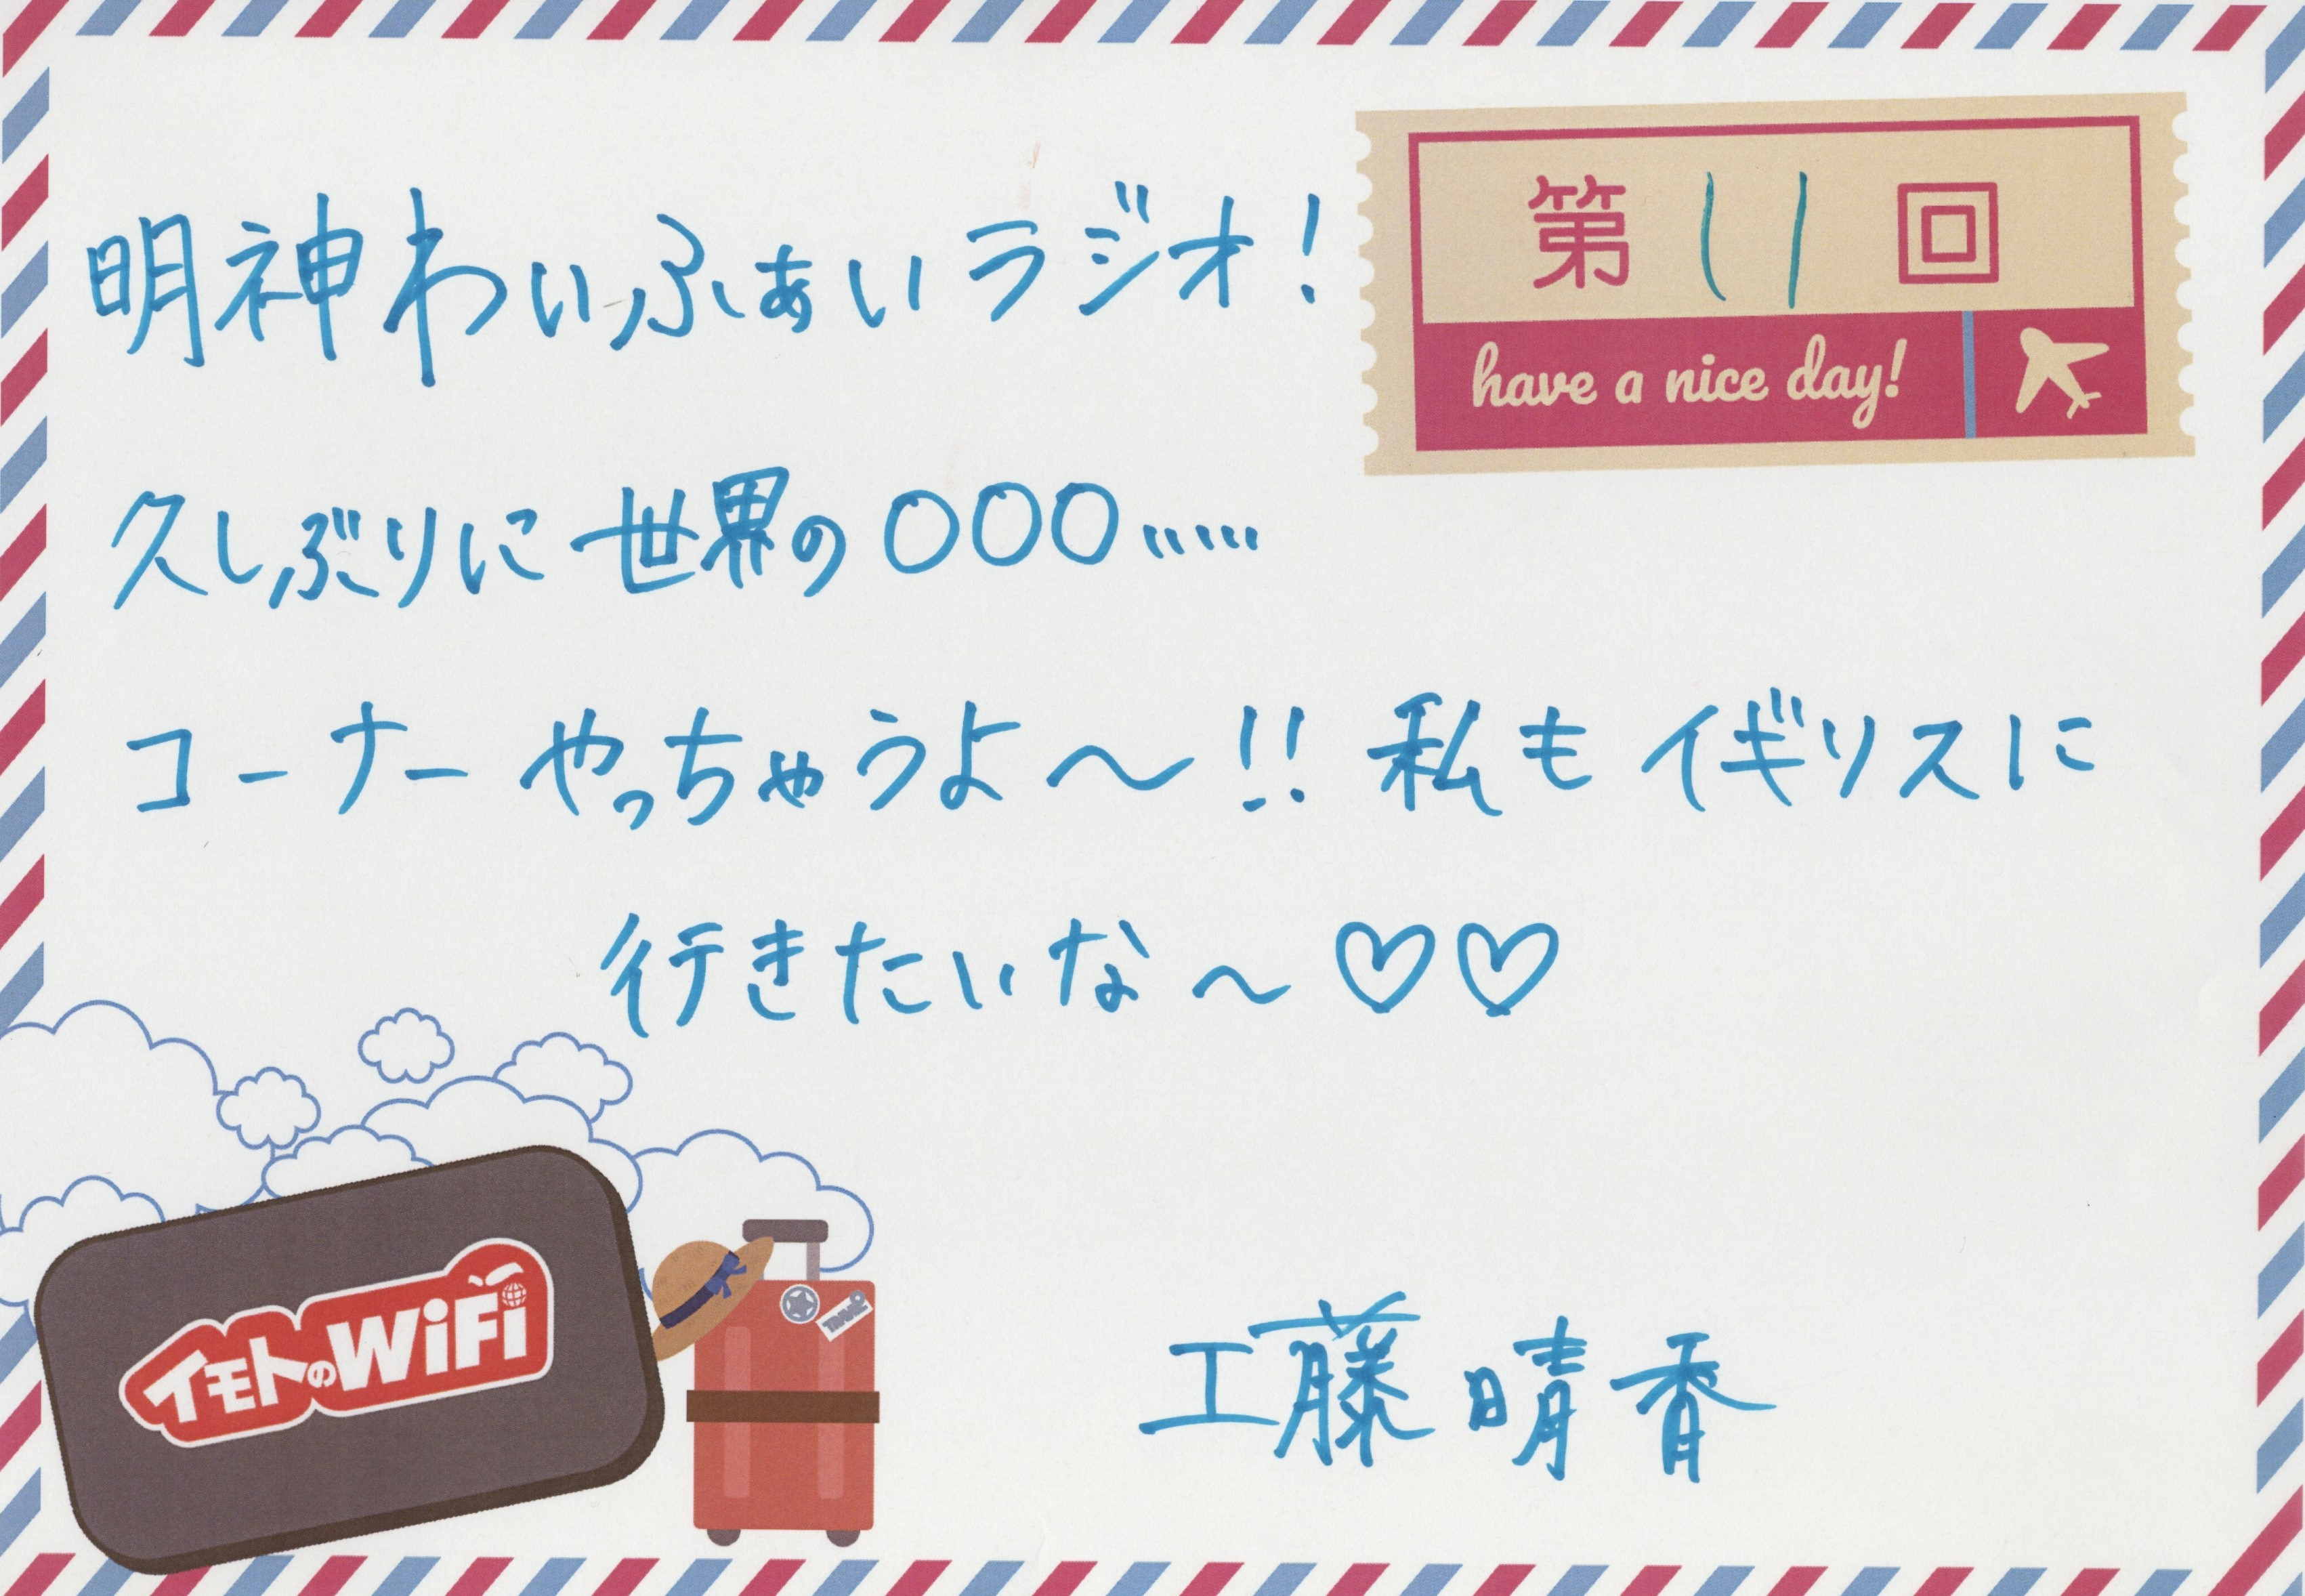 wifi11k.jpg